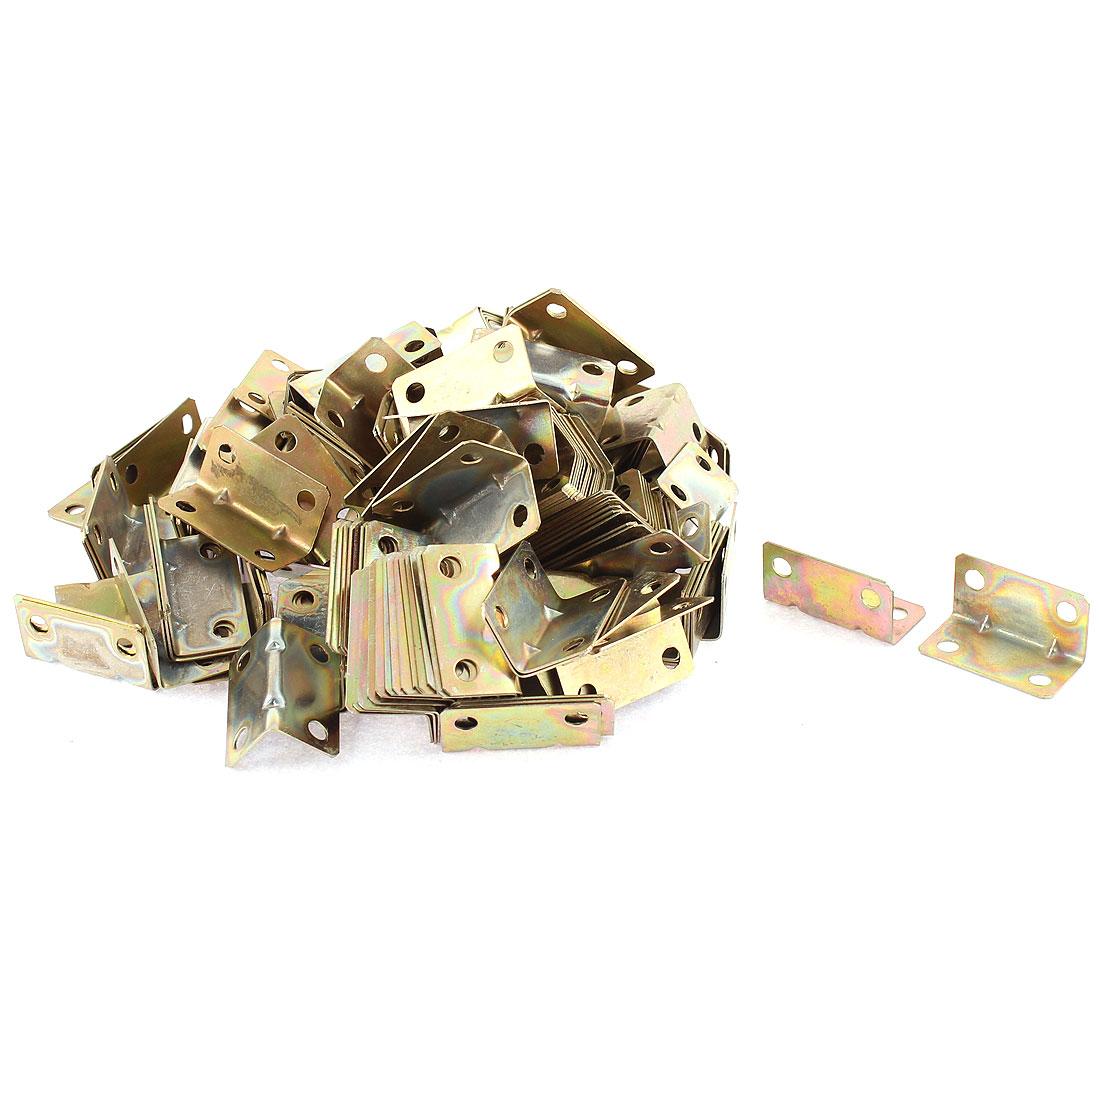 Corner Brace Joint Right Angle Bracket Support Brass Tone 16x16x32mm 200pcs